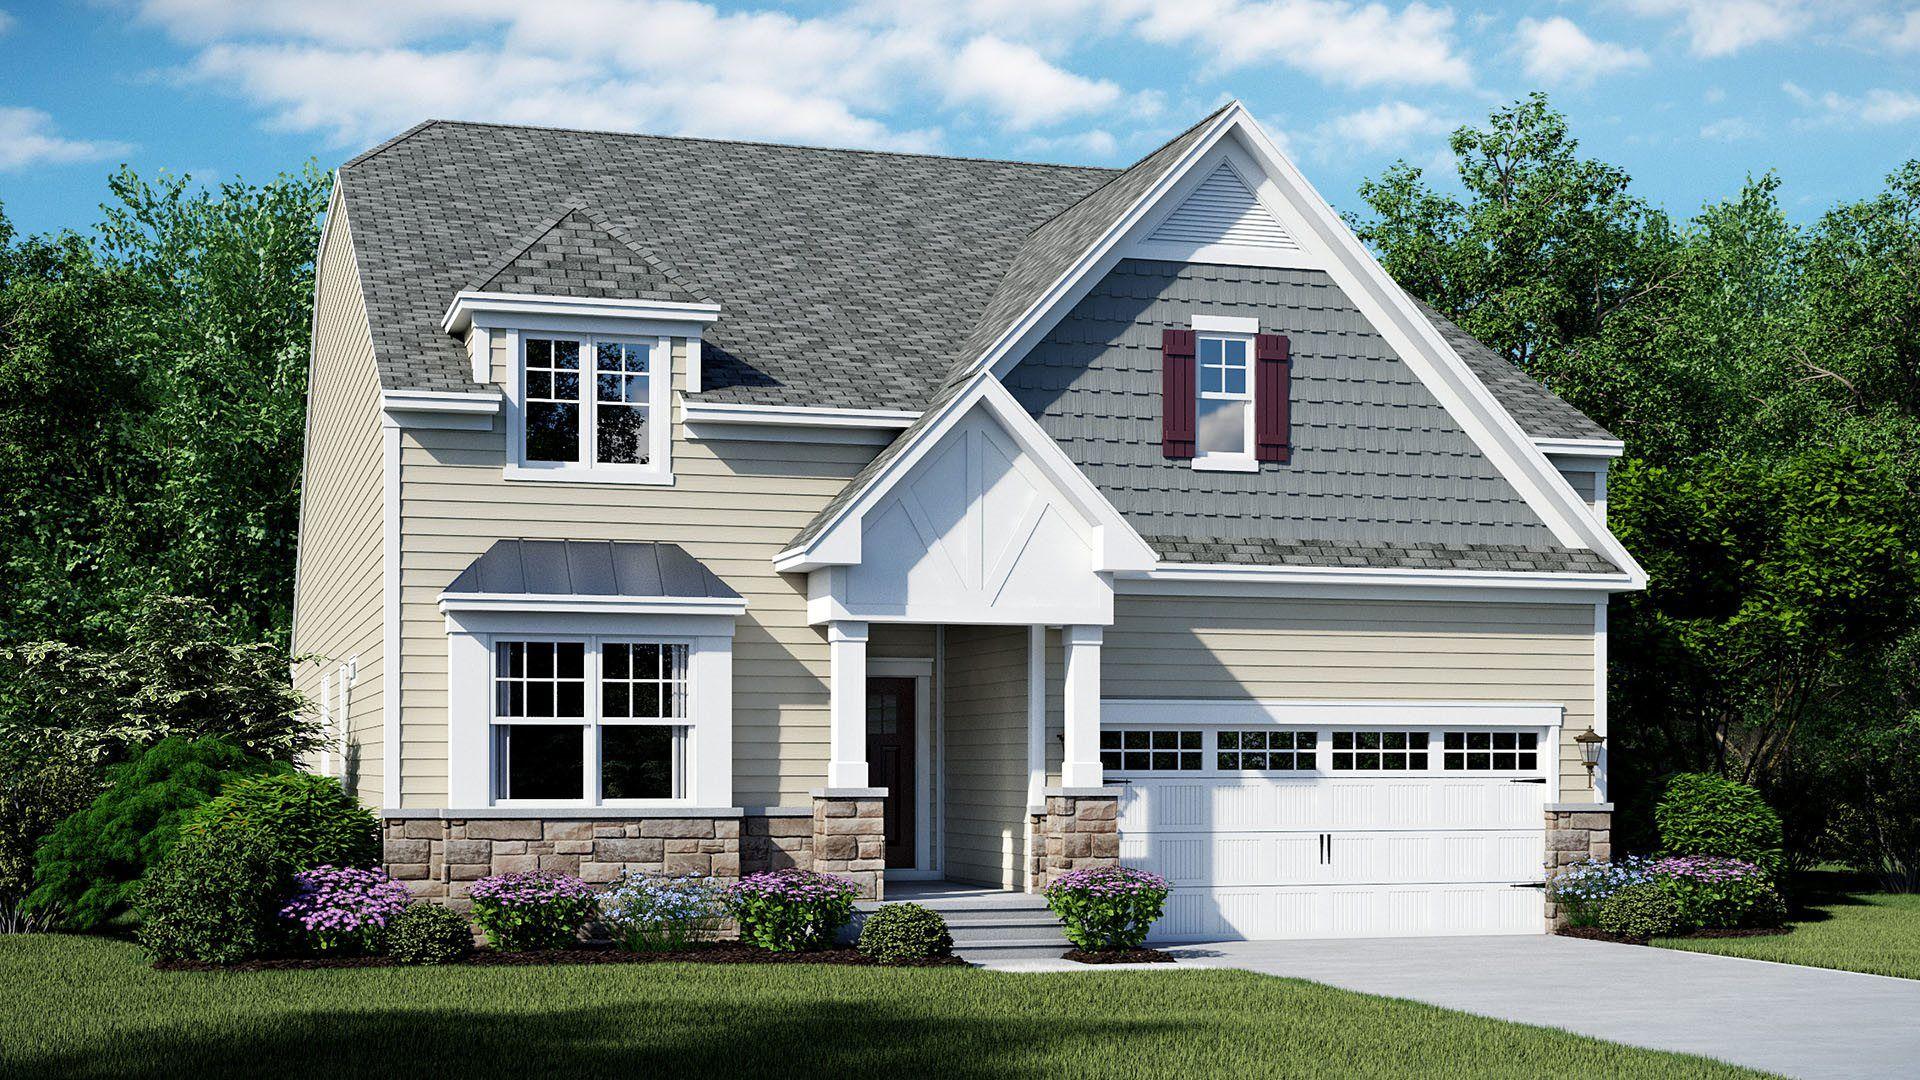 Single Family for Active at Dover 11161 Tioga Lane White Plains, Maryland 20695 United States